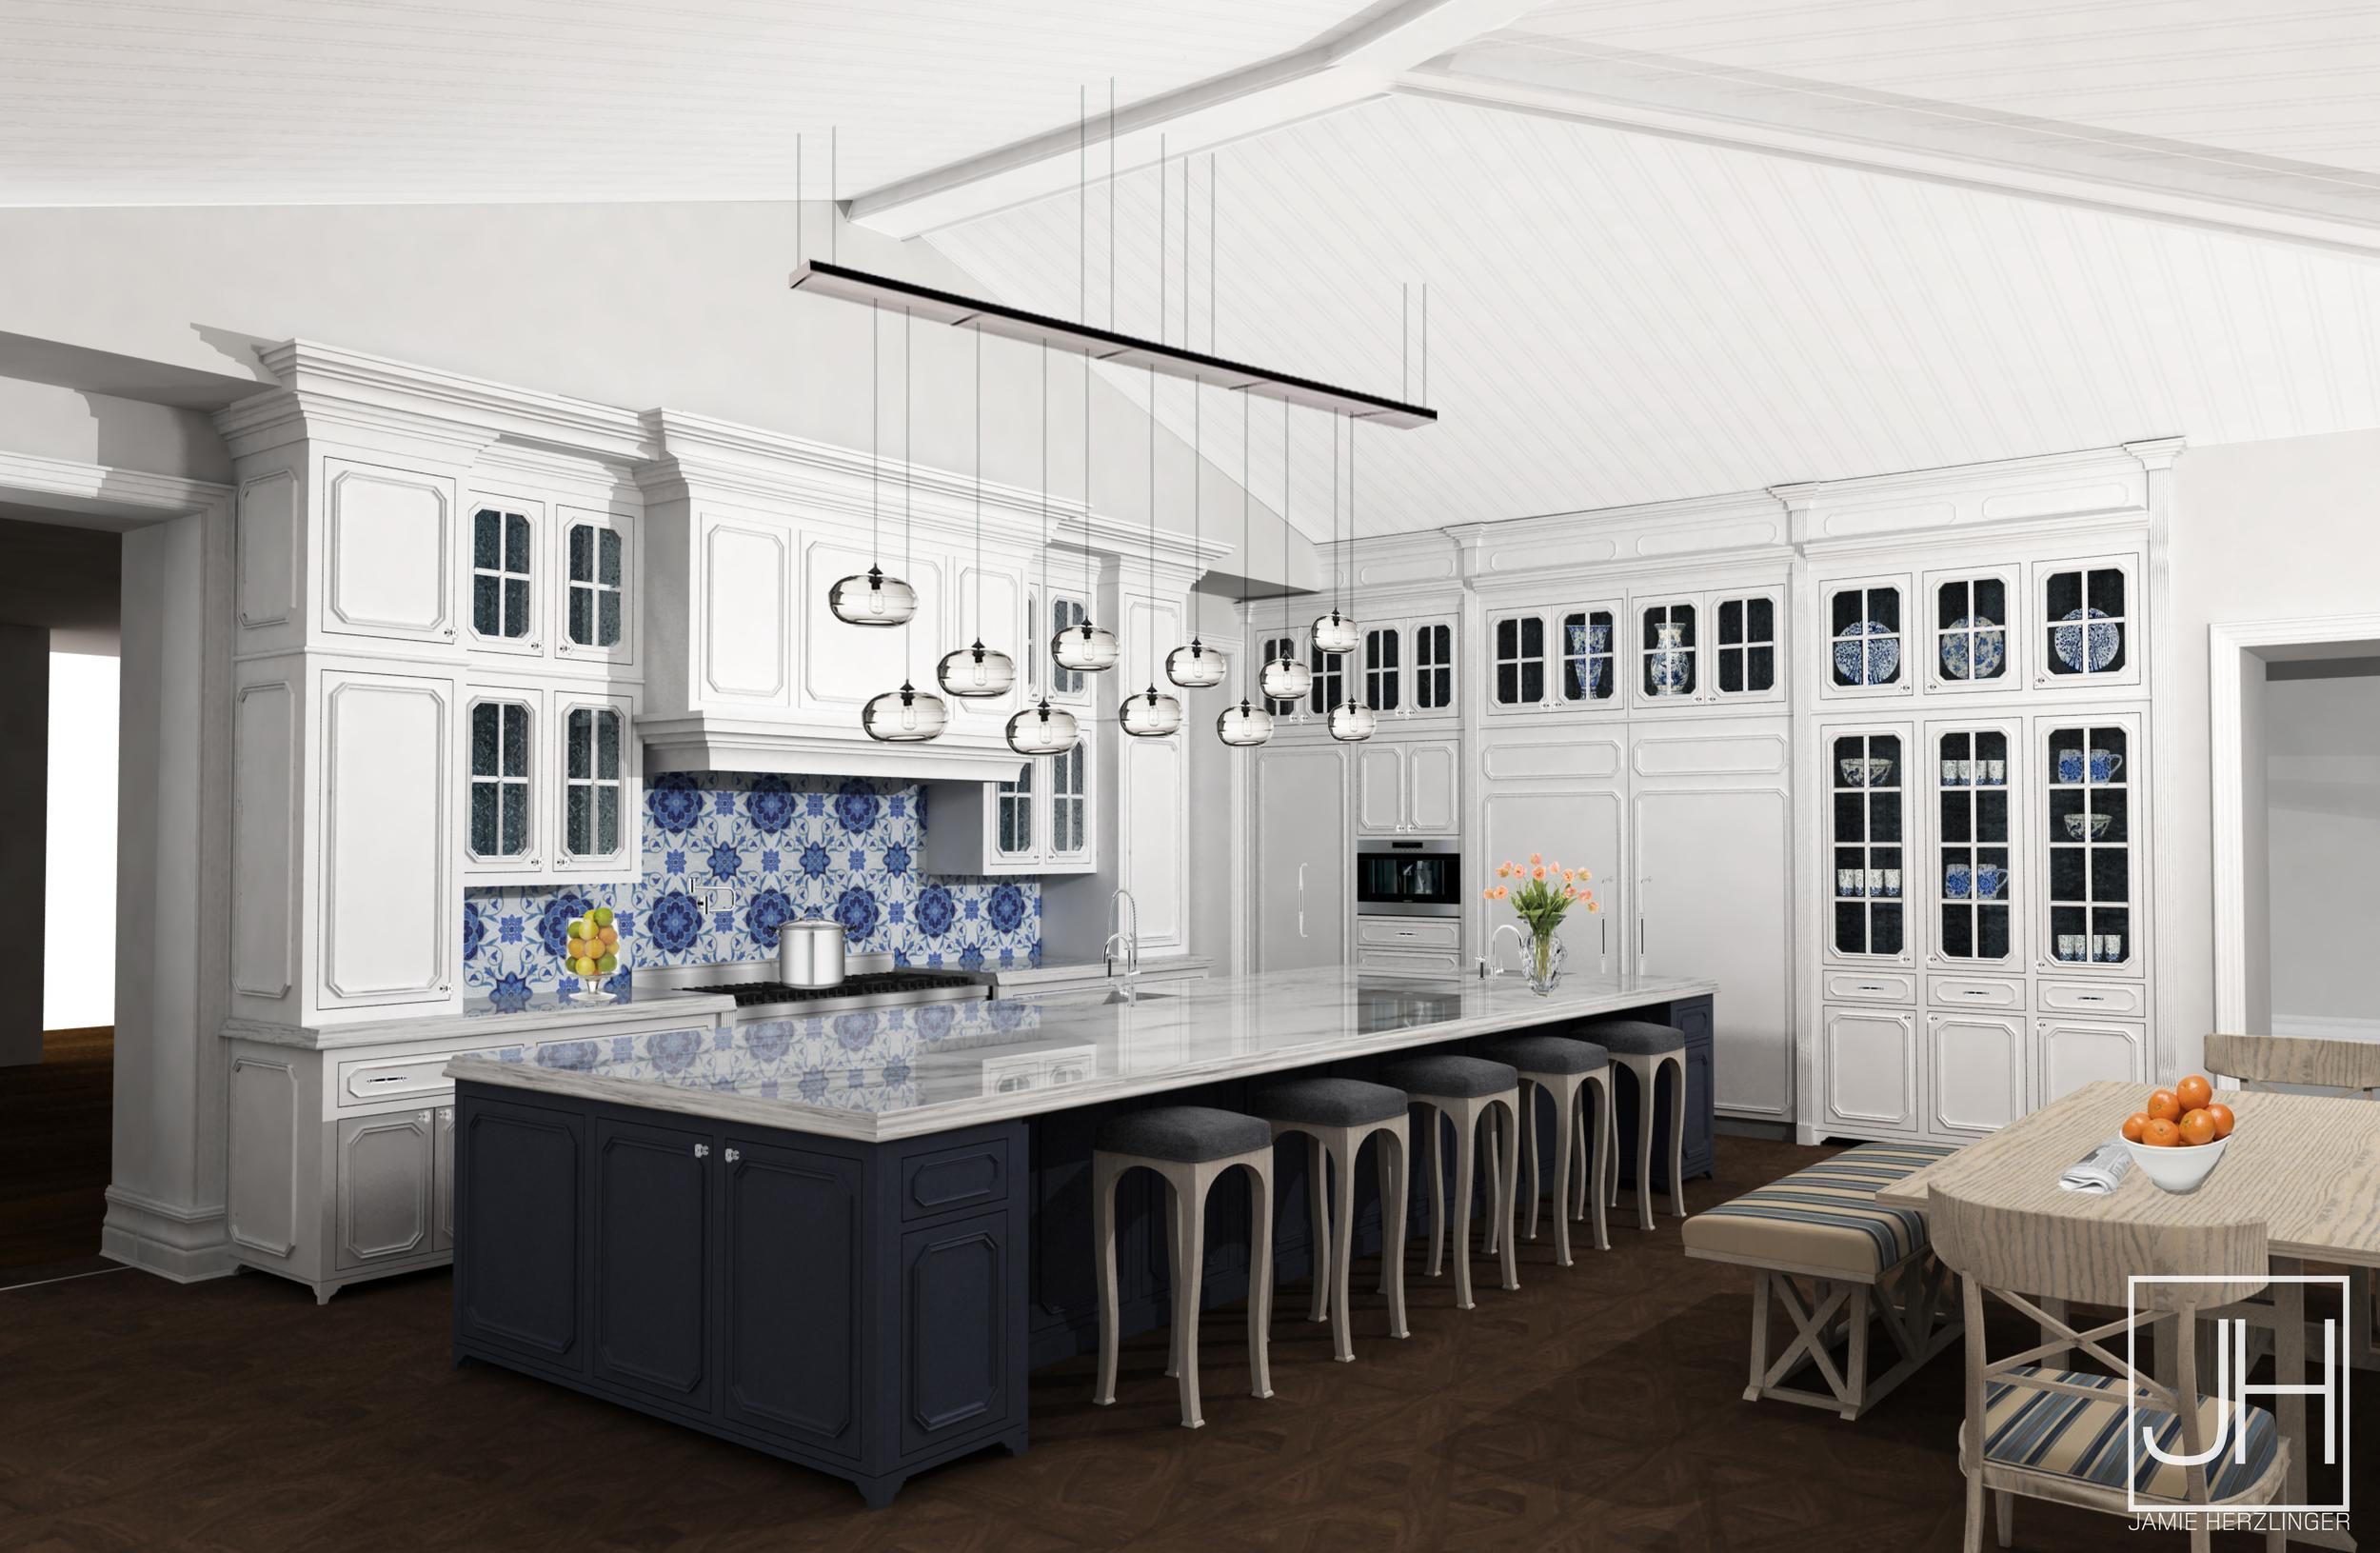 Perrin_Kitchen_040915.jpg